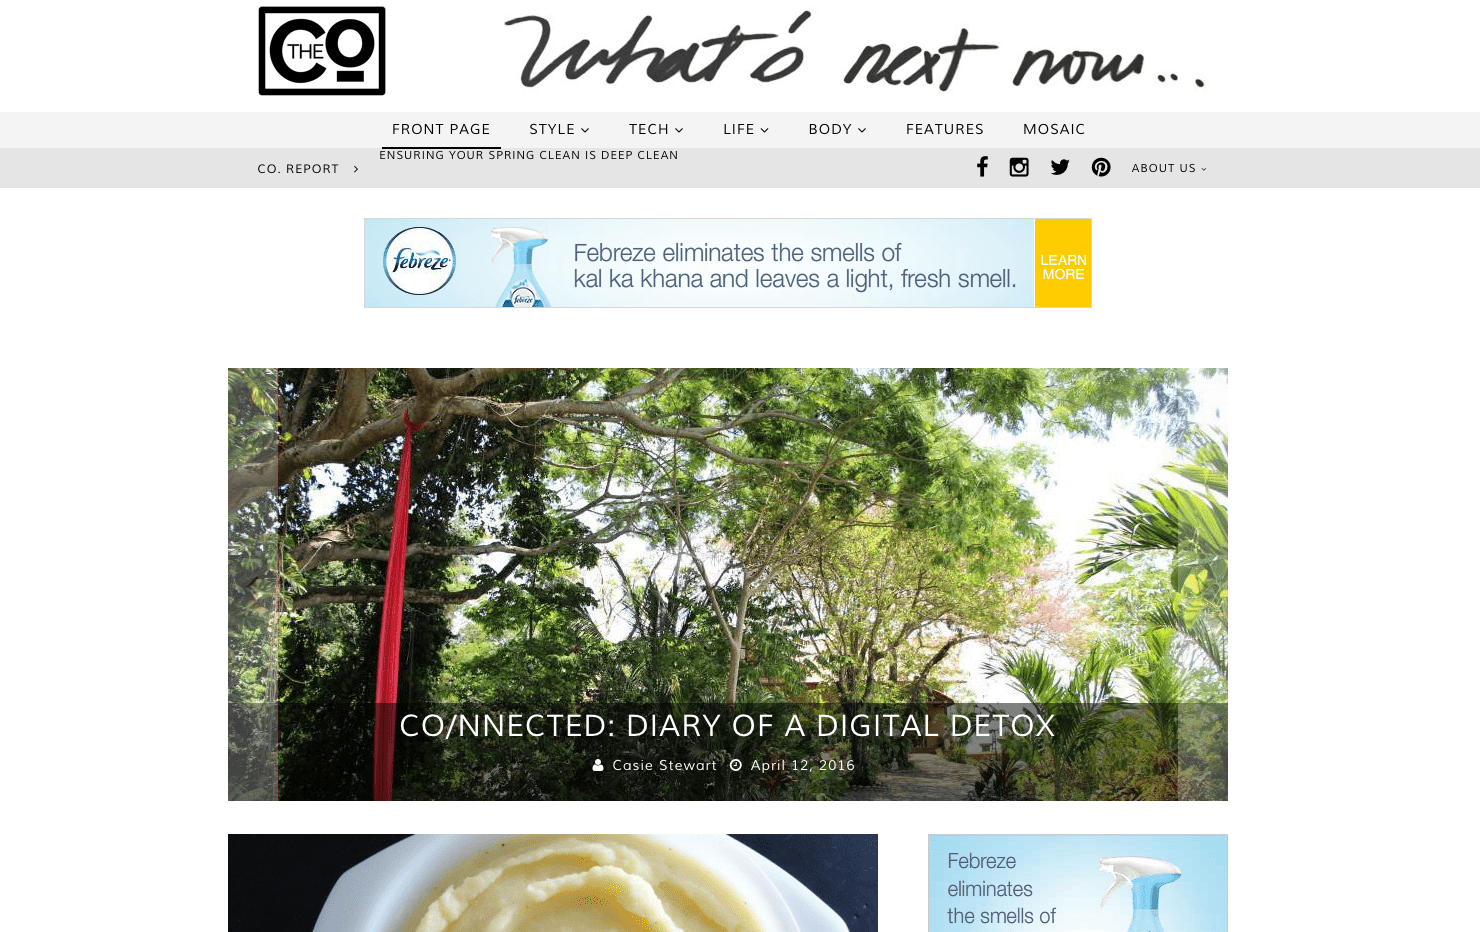 Travel   My Digital Detox Diary on The Co.